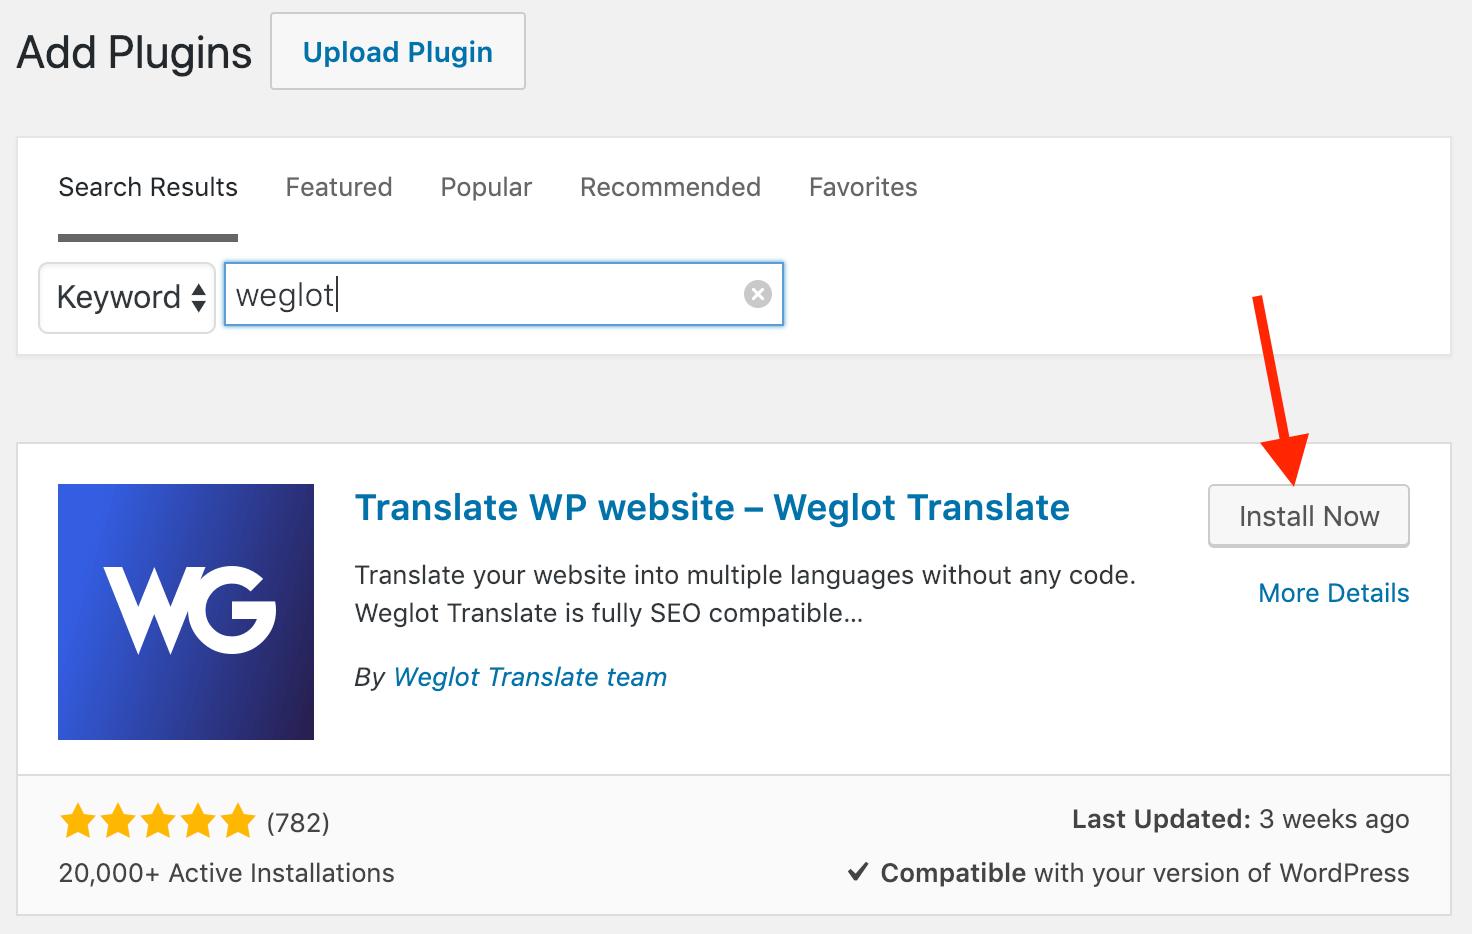 翻译wp网站weglot